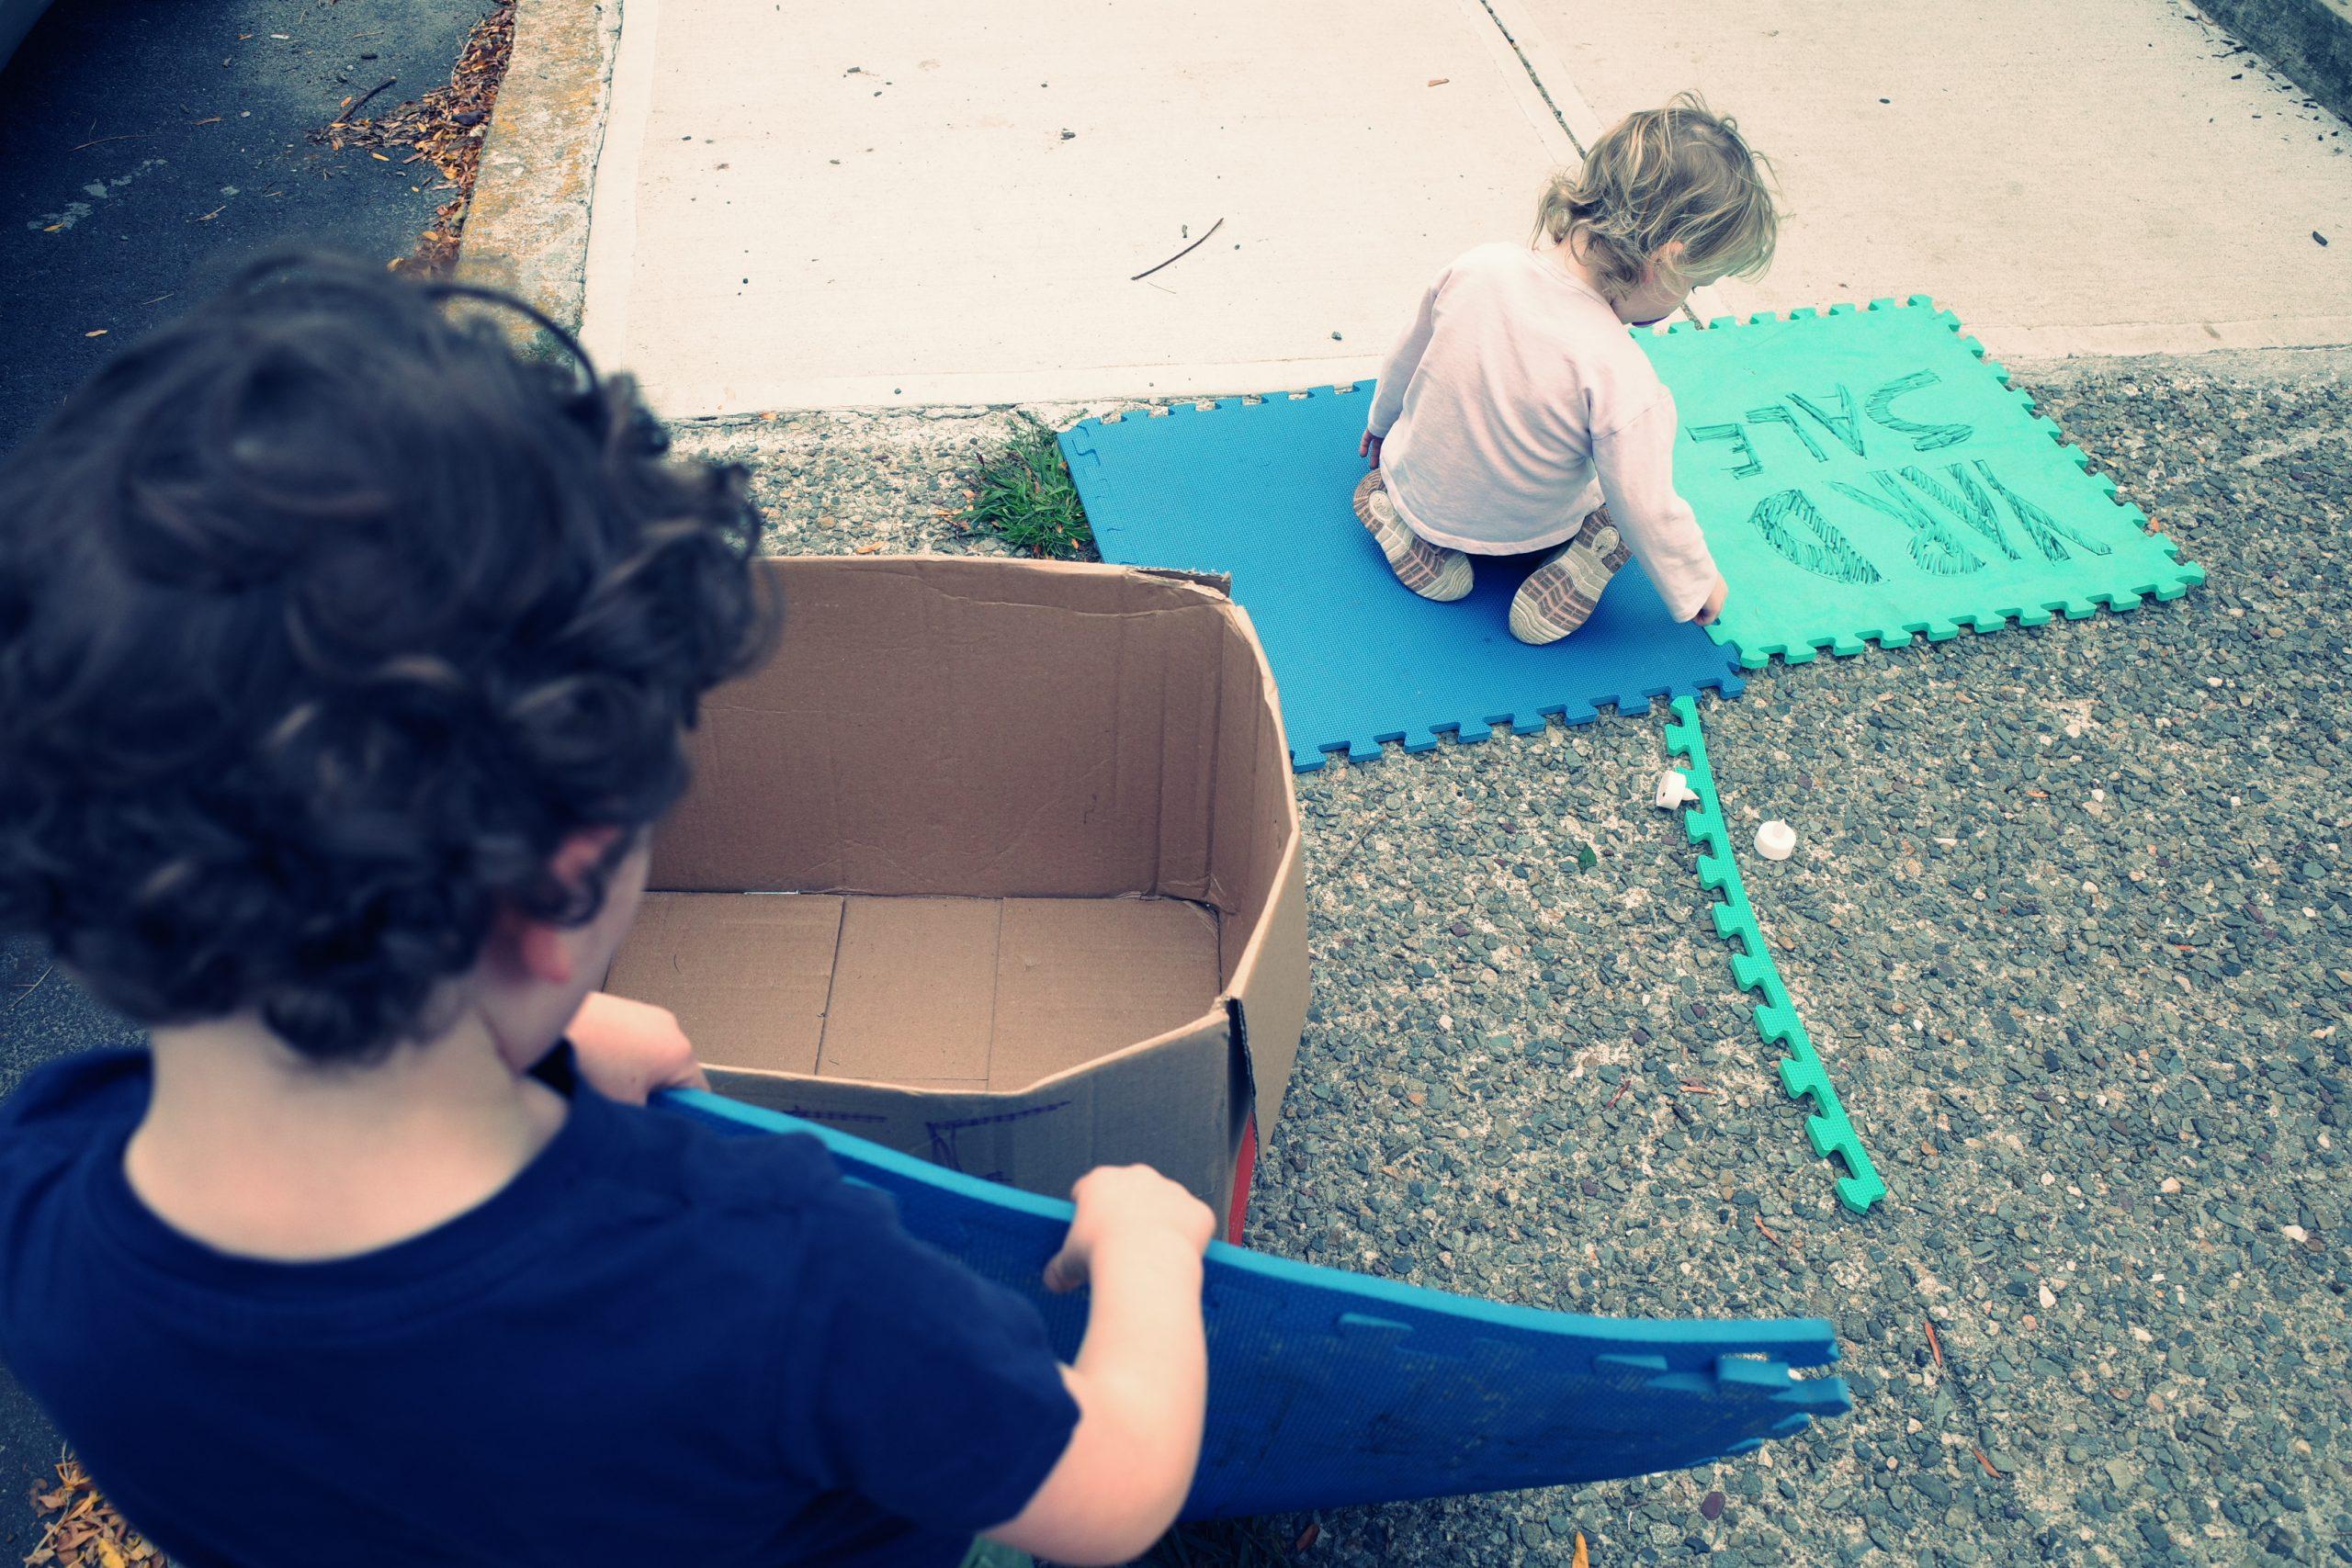 Kid street photography